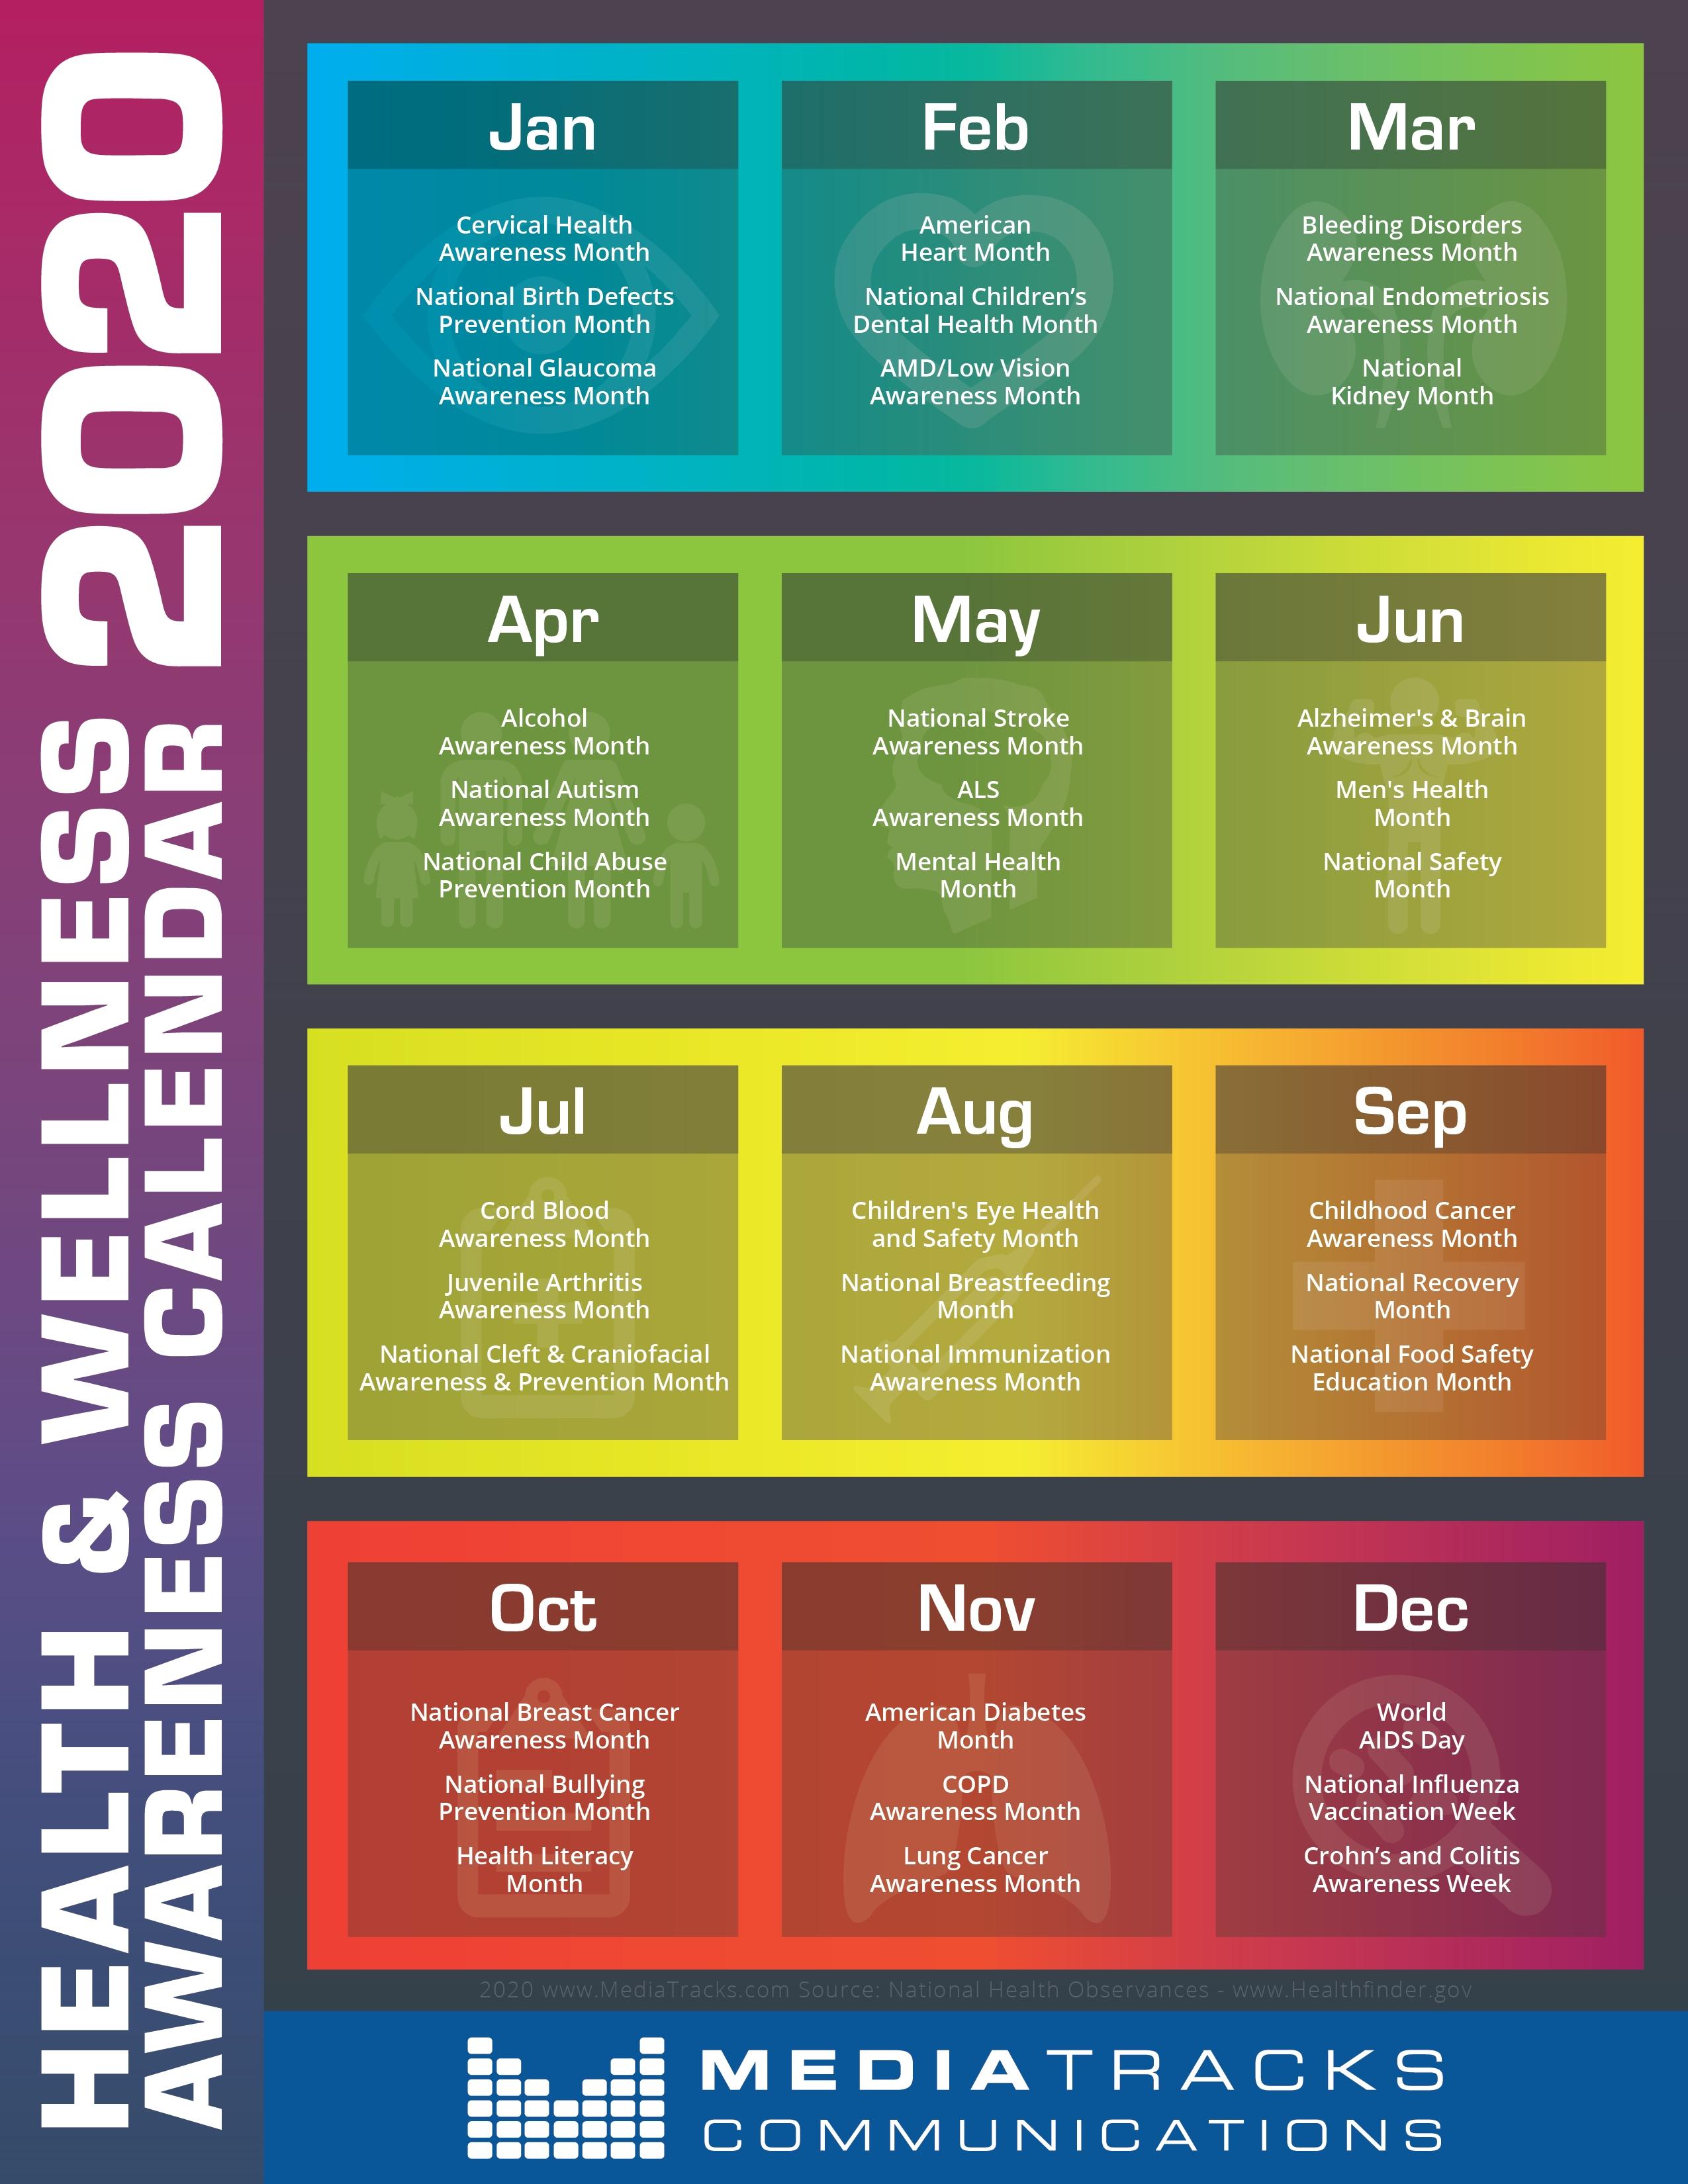 2020 Health & Wellness Awareness Calendar [Infographic National Awareness Calendar For 2021